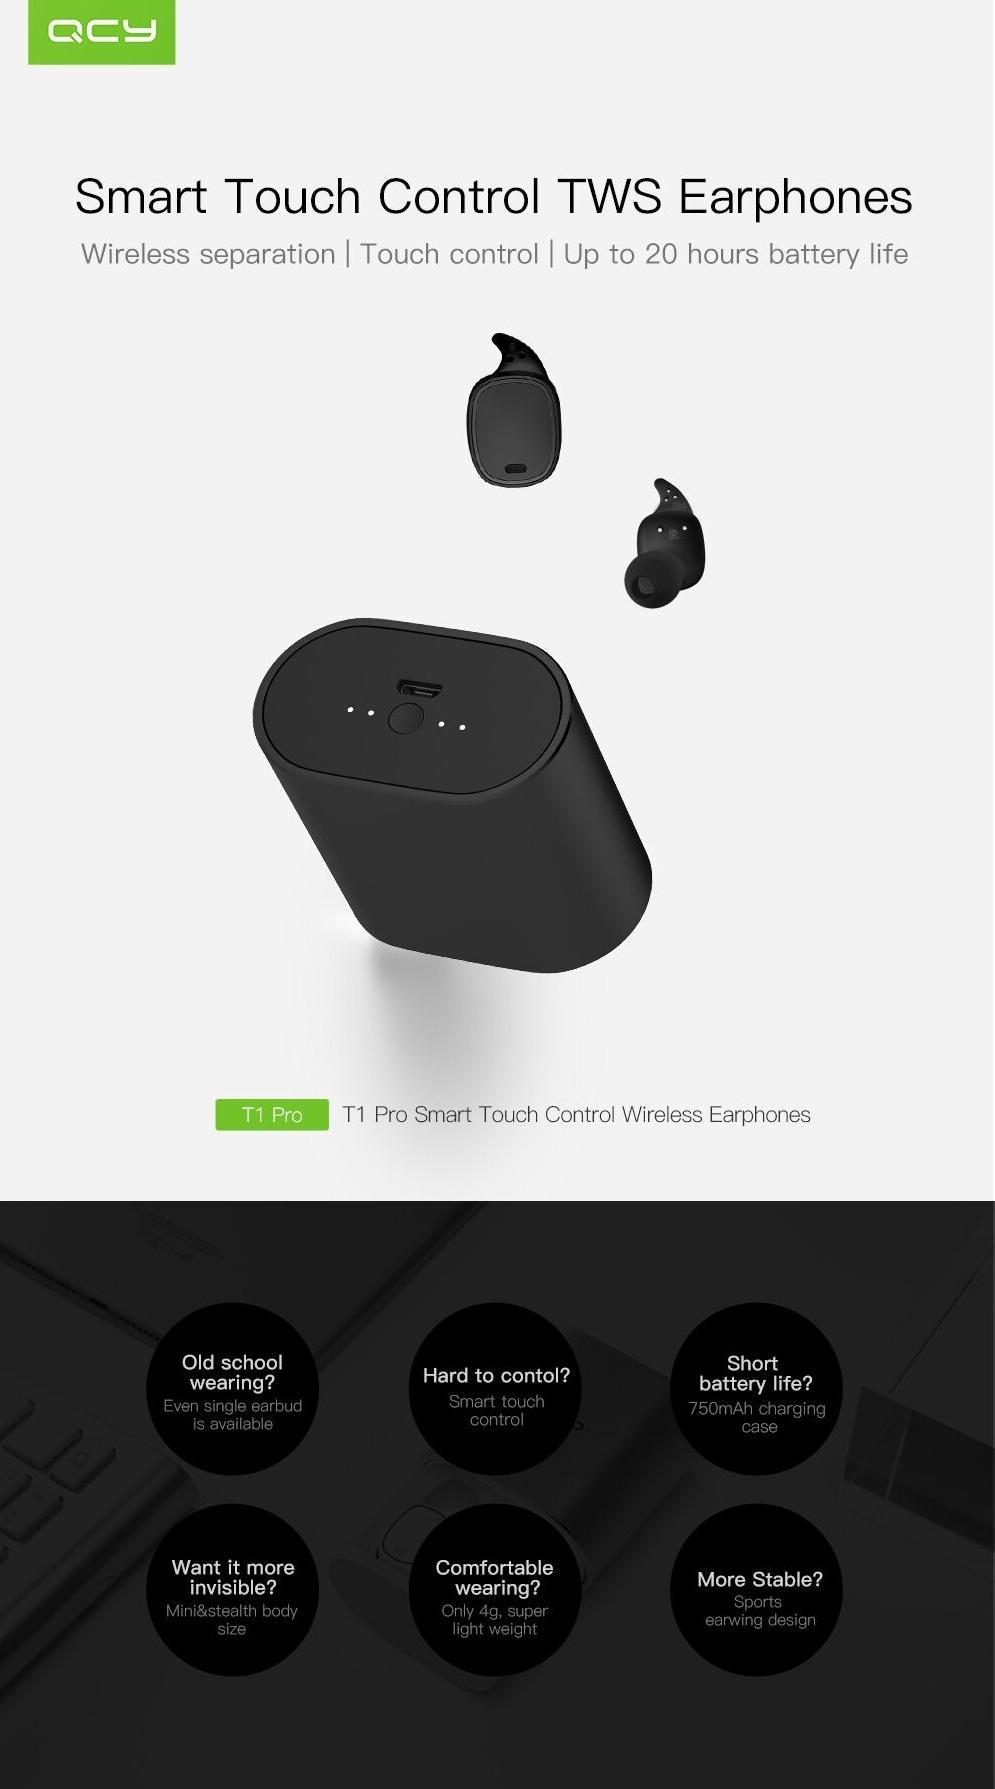 beaefa72aeb [True Wireless] QCY T1 PRO TWS Dual Bluetooth Earphones IPX4 Waterproof  Headphones with Charging